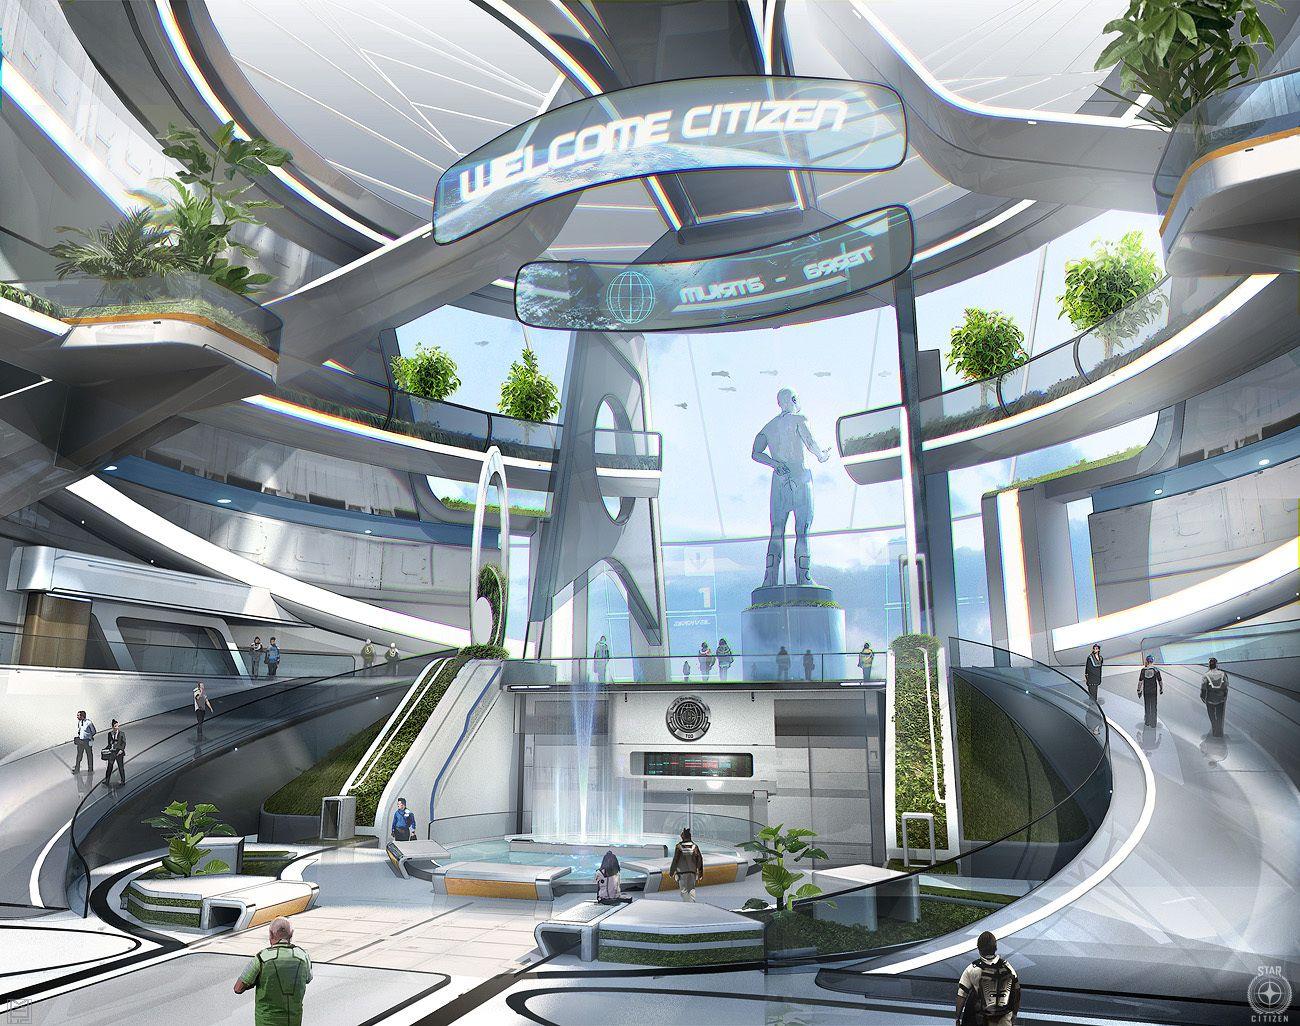 pin by yi mu on pinterest sci fi futuristic and future city. Black Bedroom Furniture Sets. Home Design Ideas